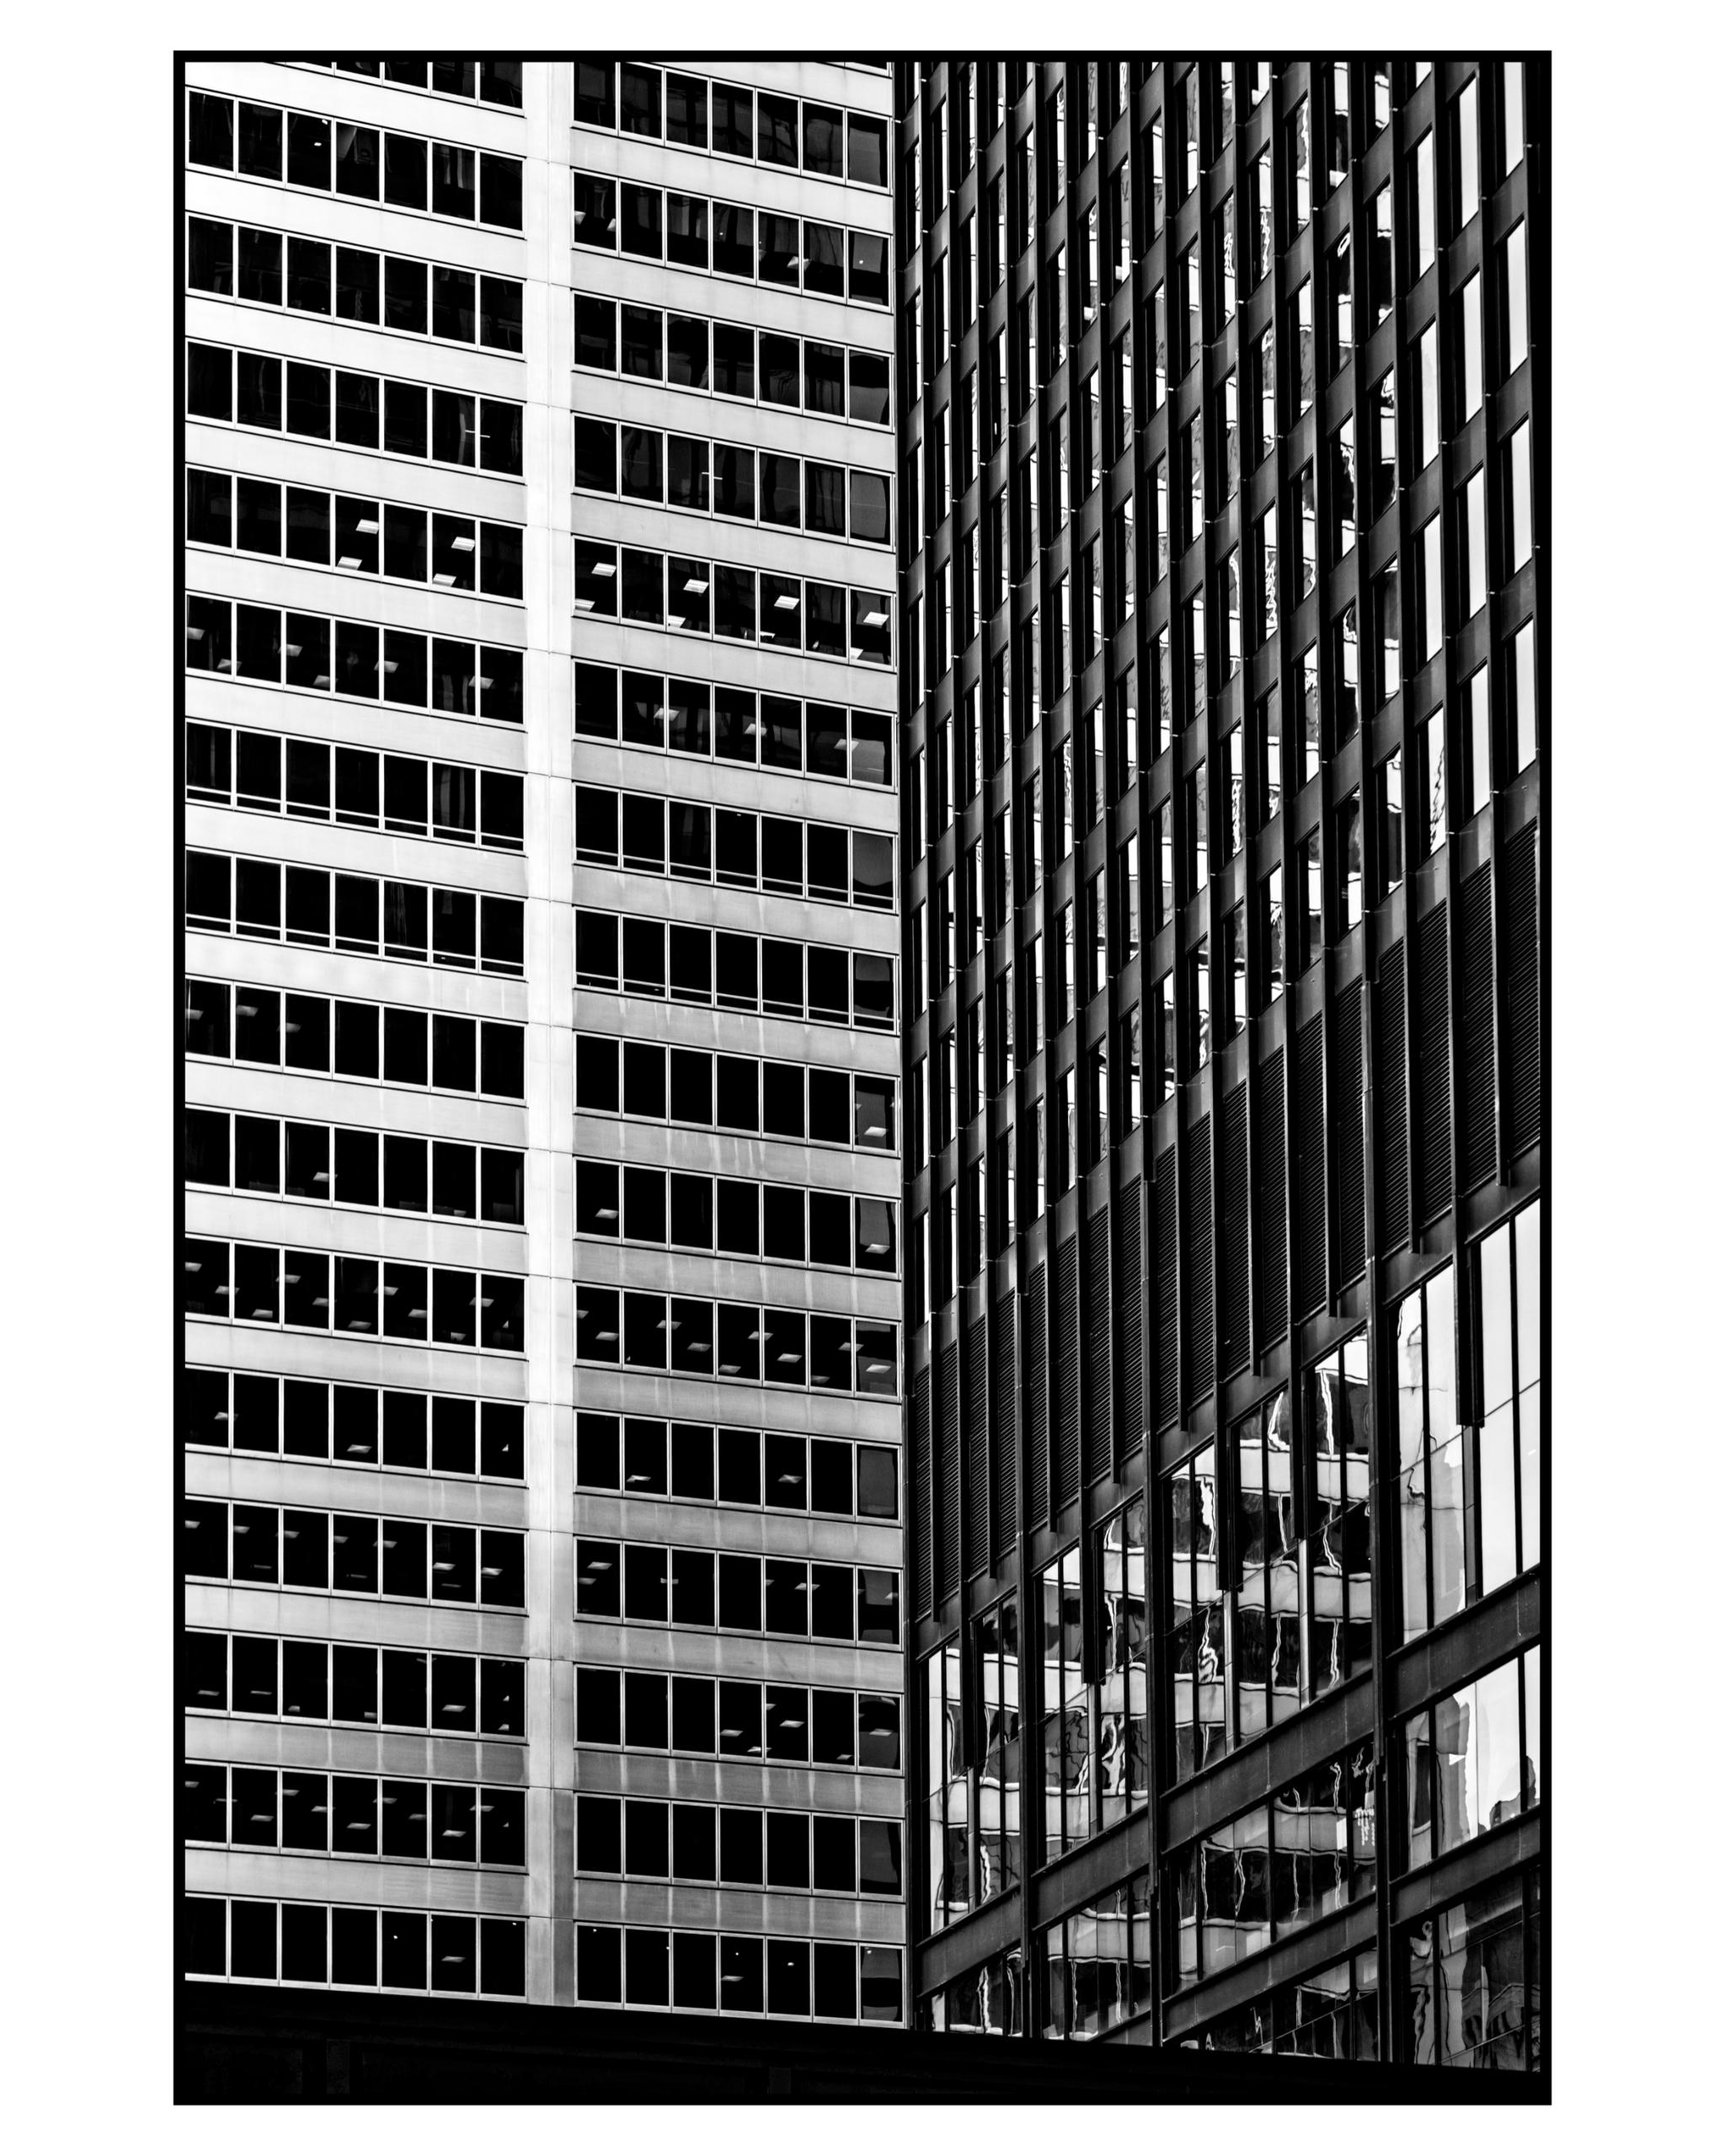 City/Sky Series: Endless City S - attilaataner | ello